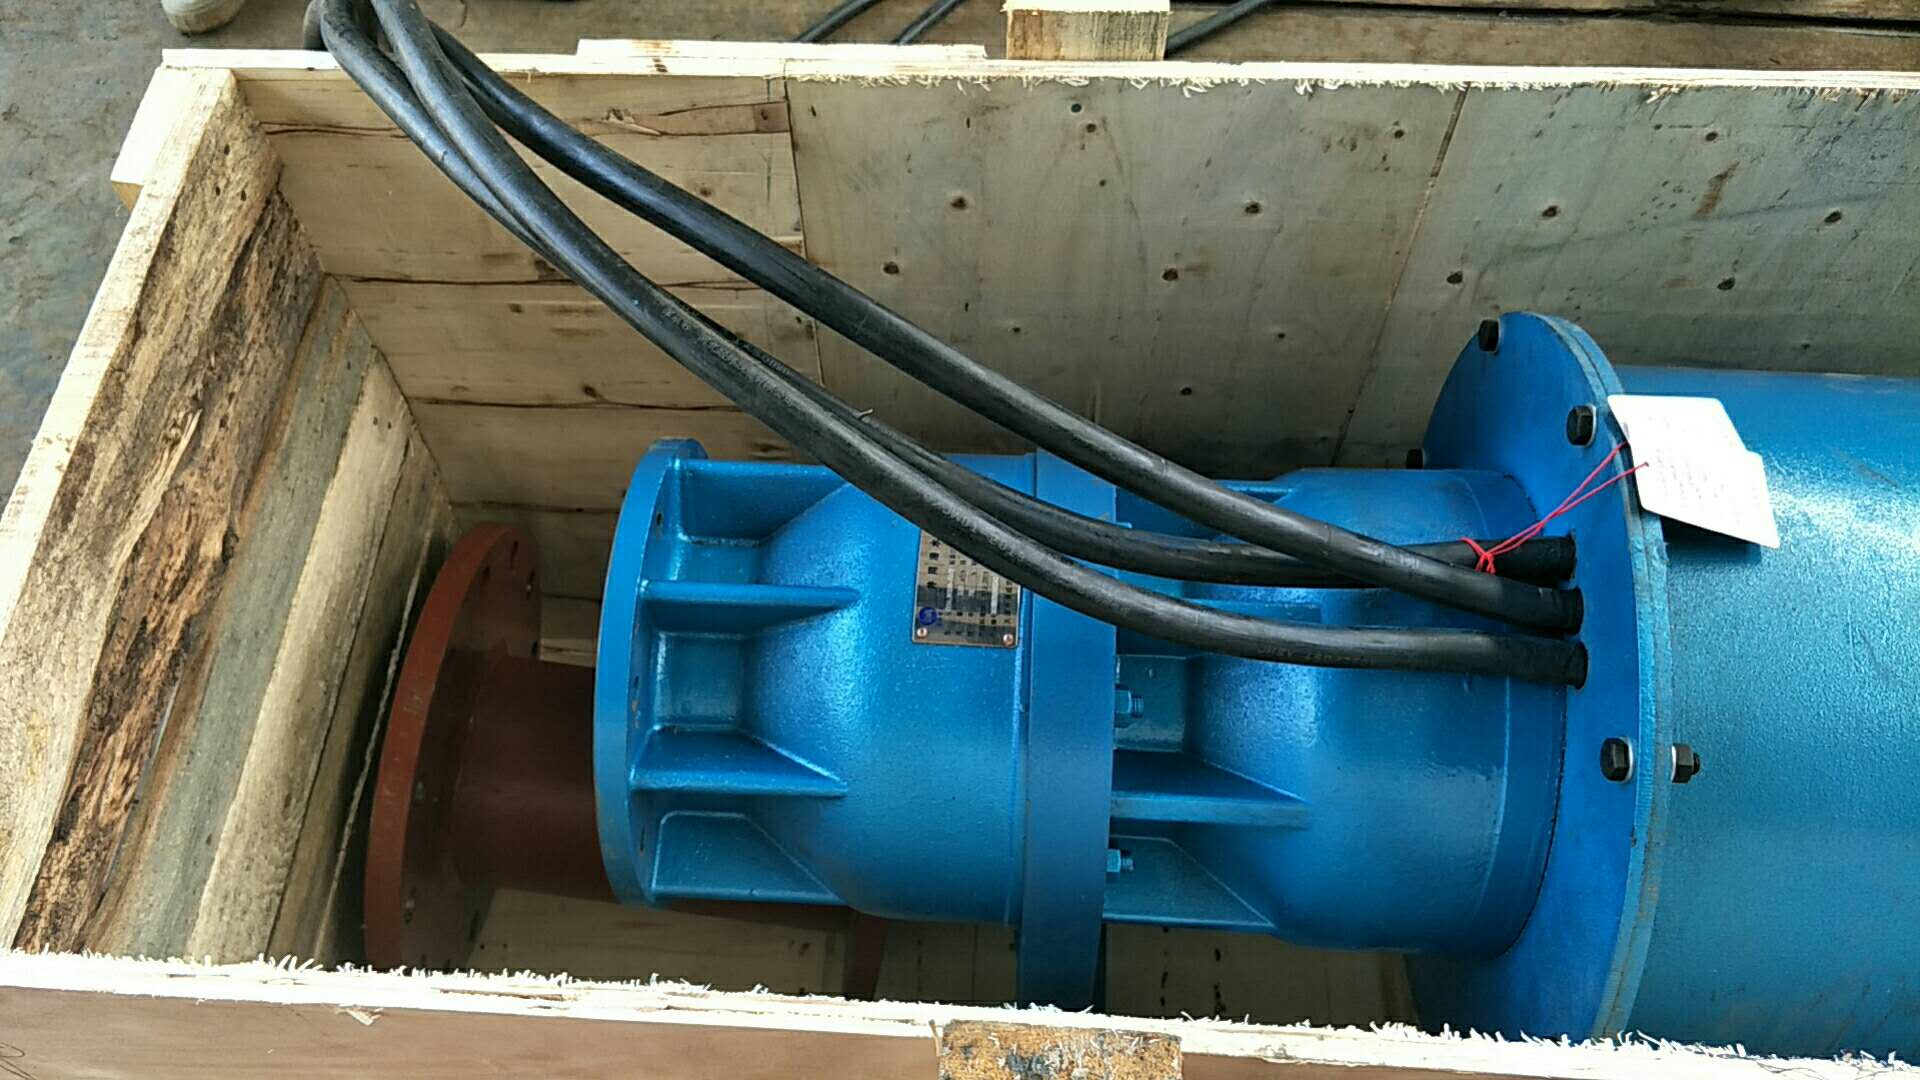 300QJW320-70-110KW卧式潜水泵发往江西第5张-潜水电机-潜水电泵-高压潜水电机-天津潜成泵业